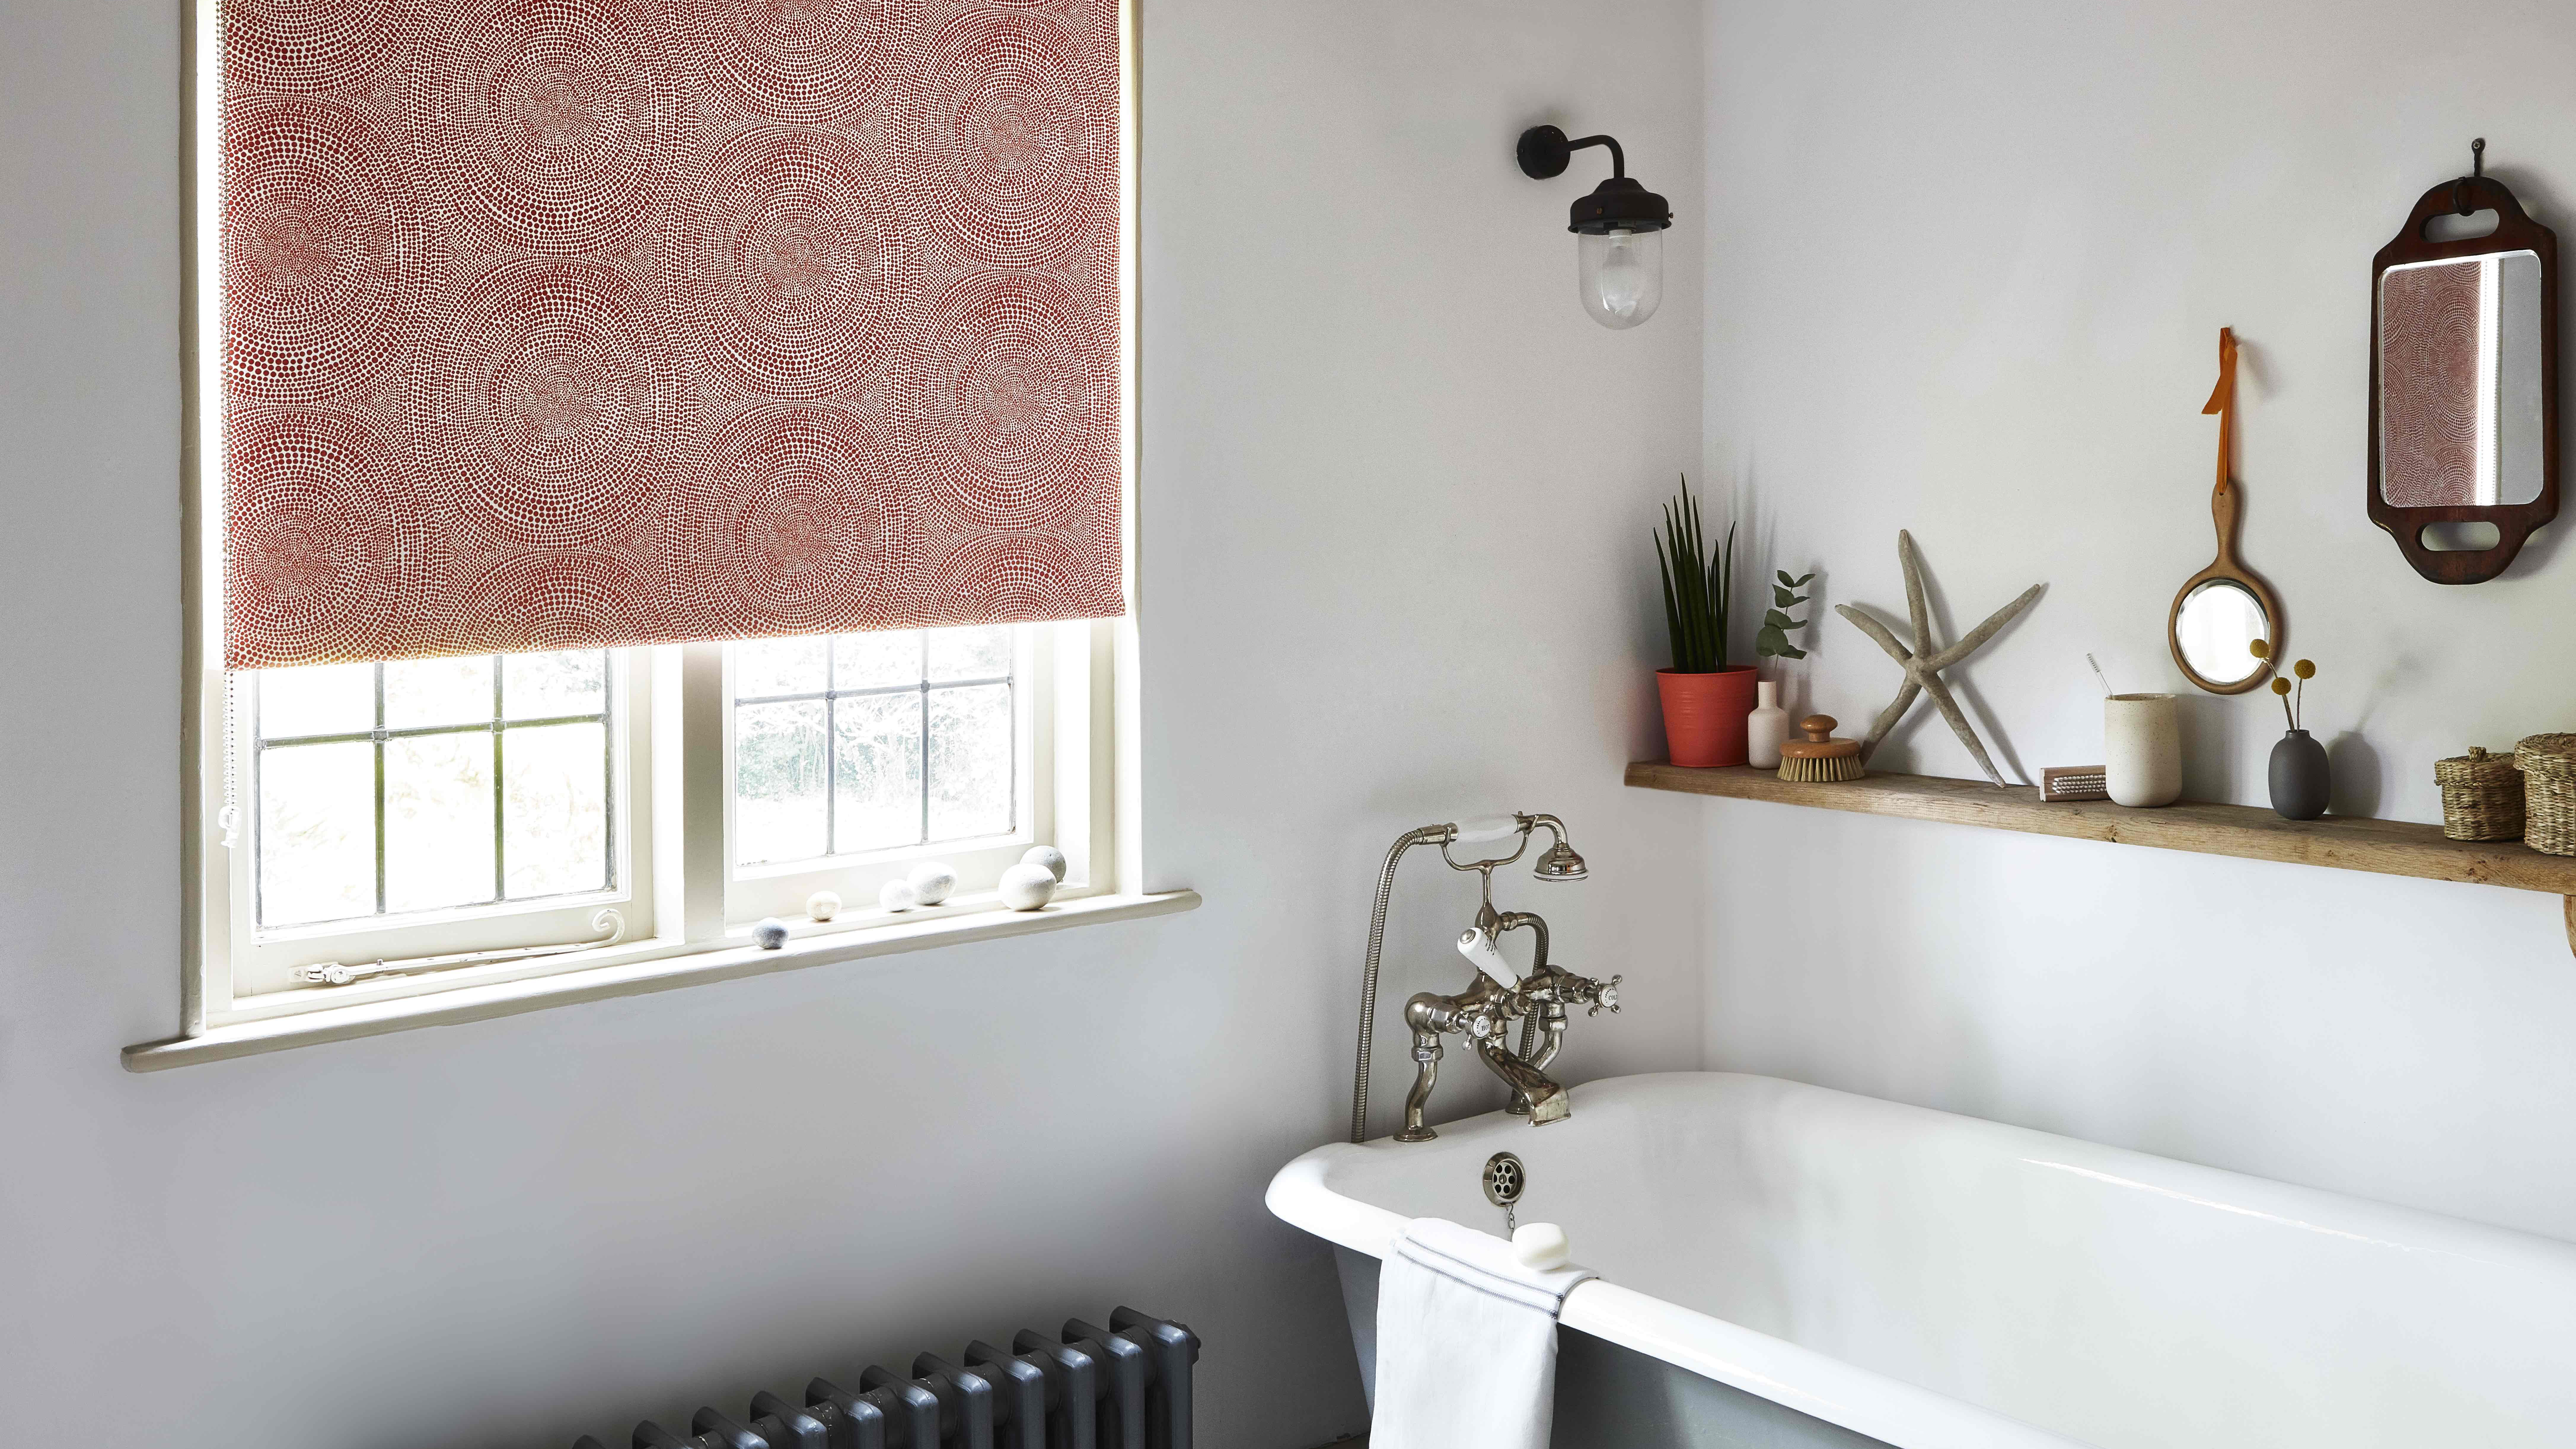 11 Bathroom Window Ideas You Ll Love, Bathroom Window Treatments Curtains